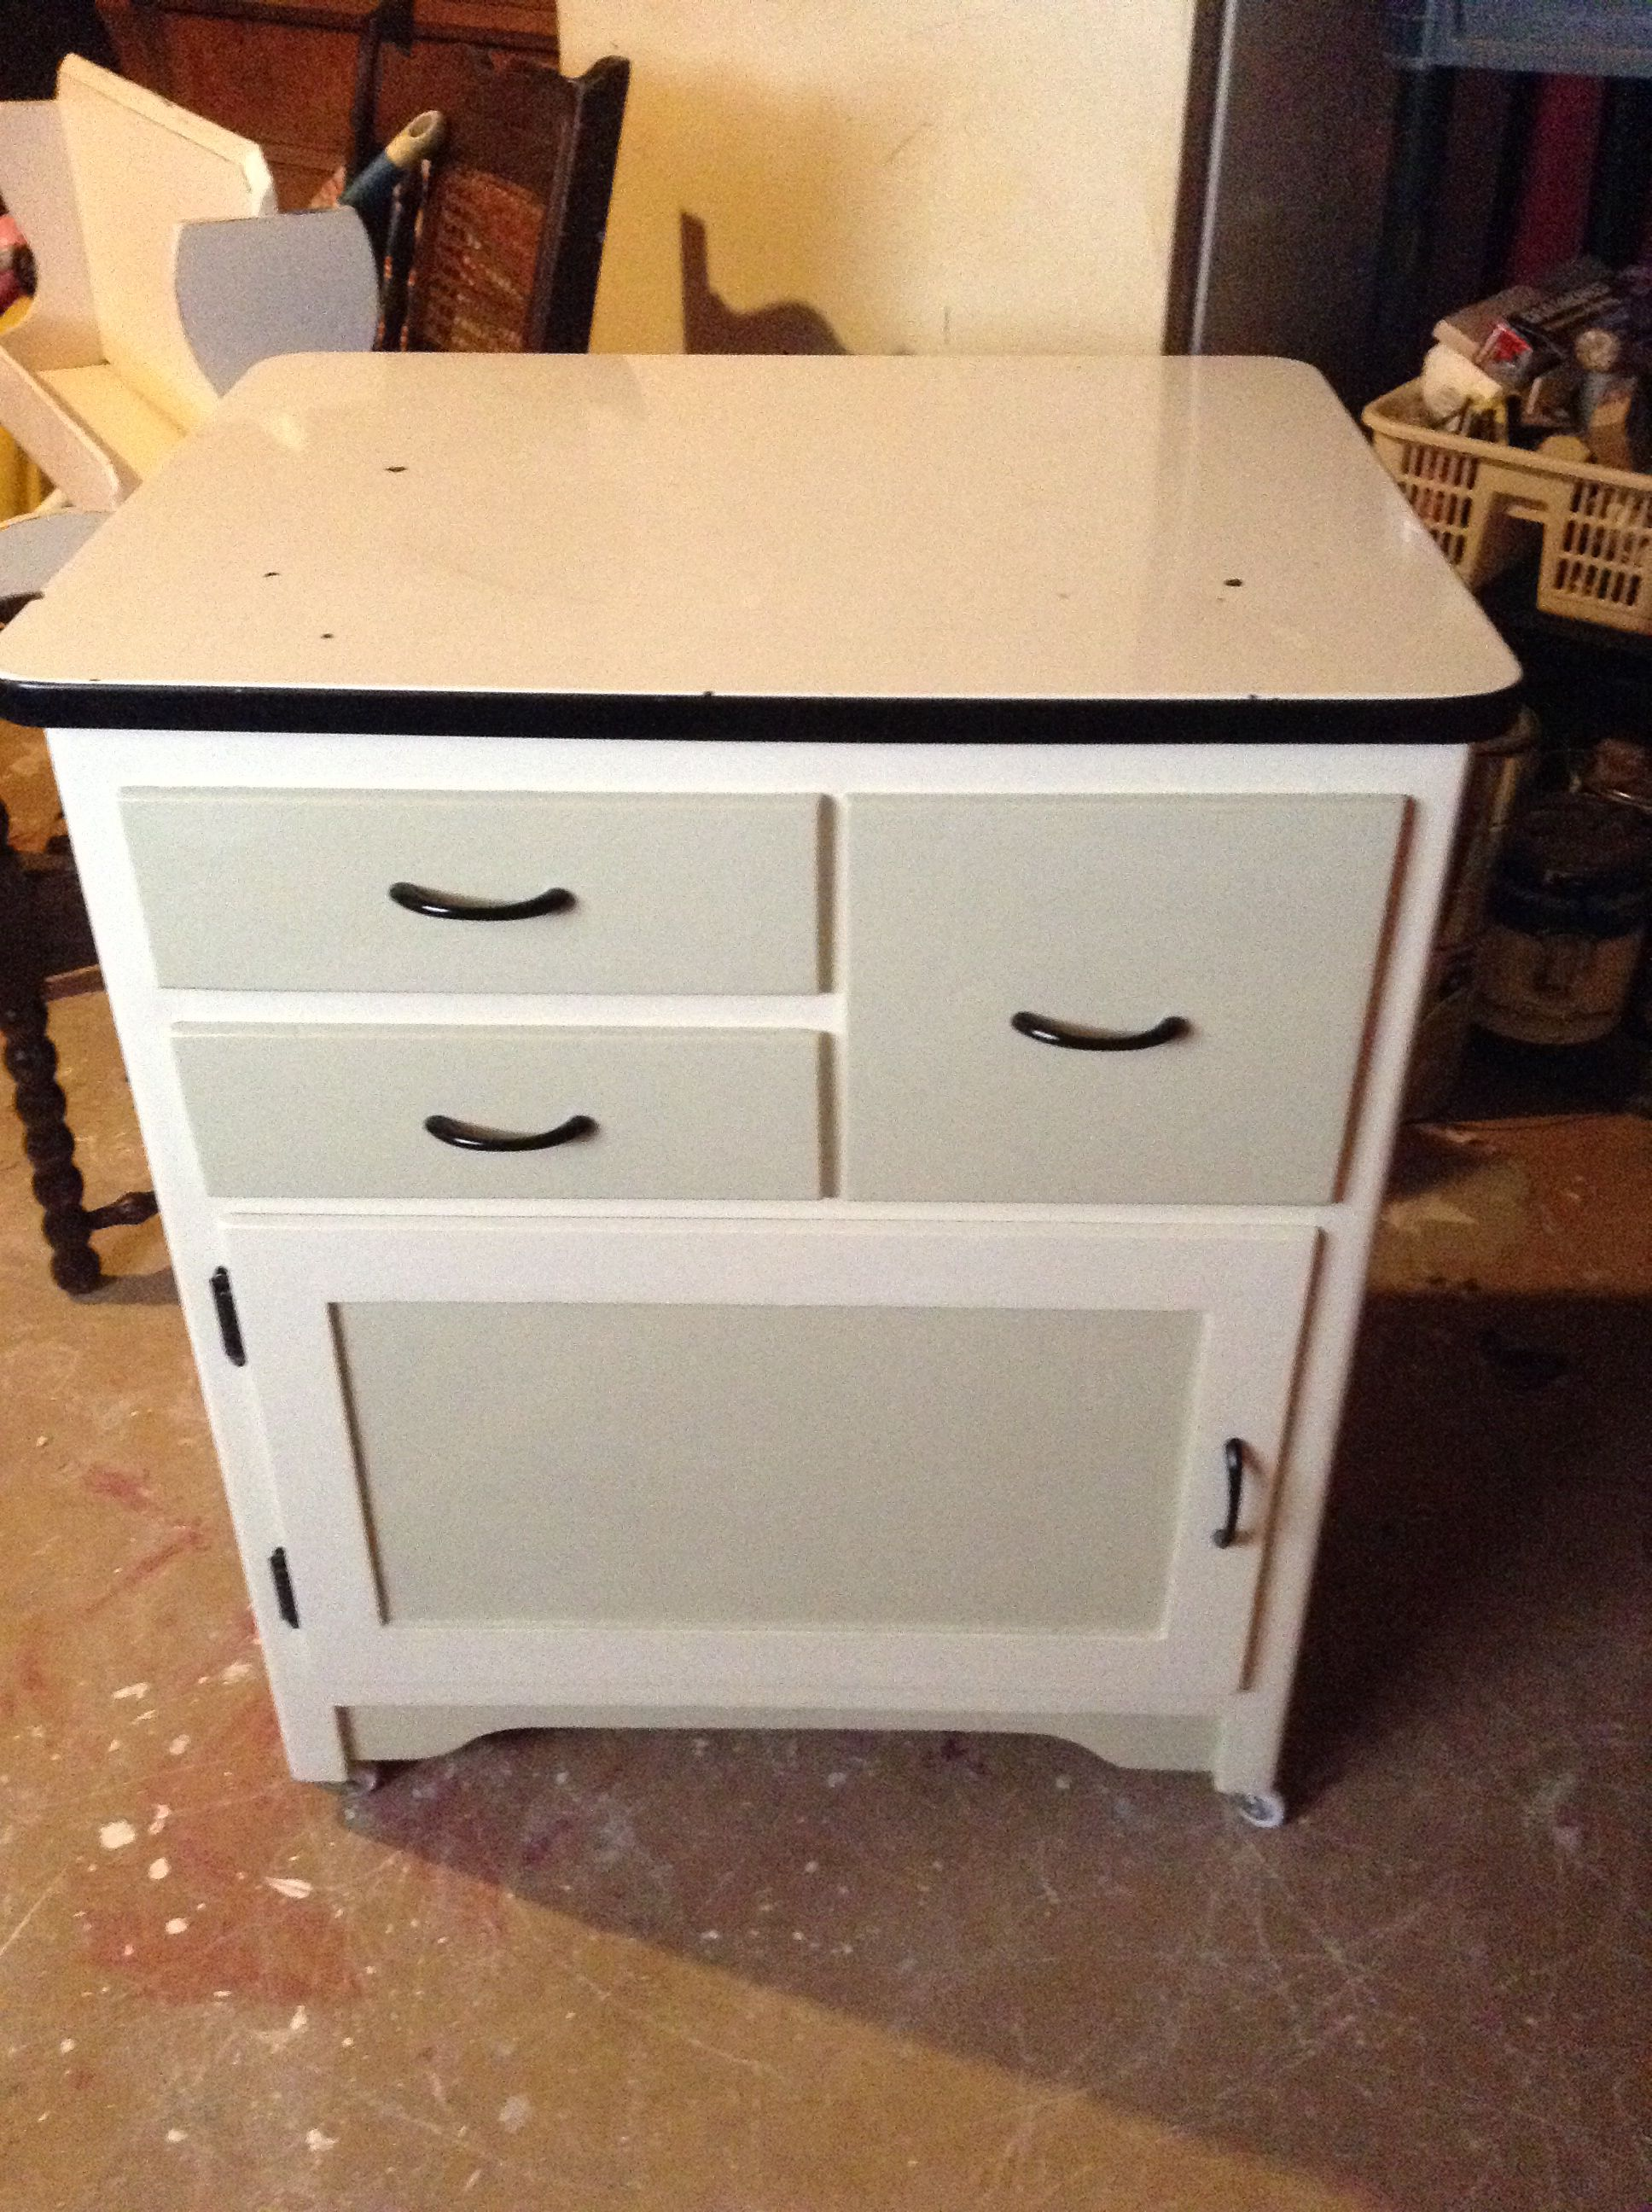 Enamel Top Cabinet Painted Enamel Top Cabinet Paint Pinterest Tops Cabinets